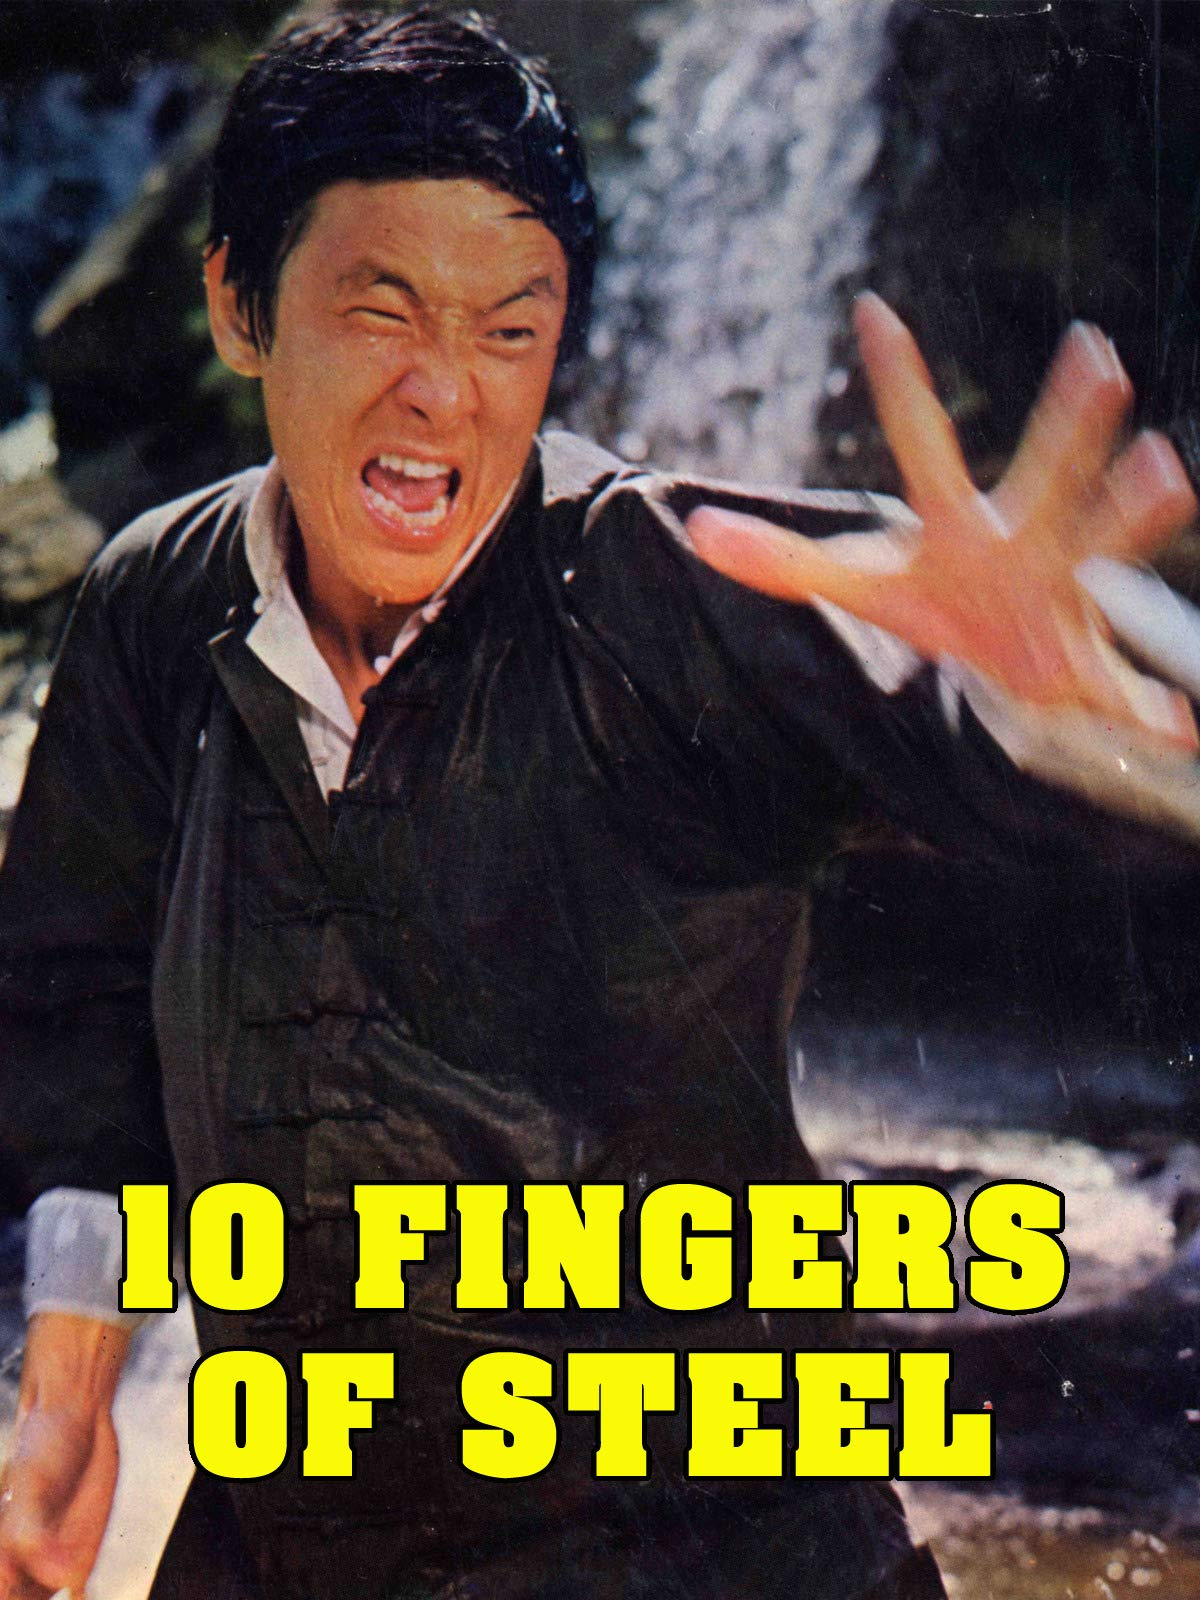 10 Fingers of Steel